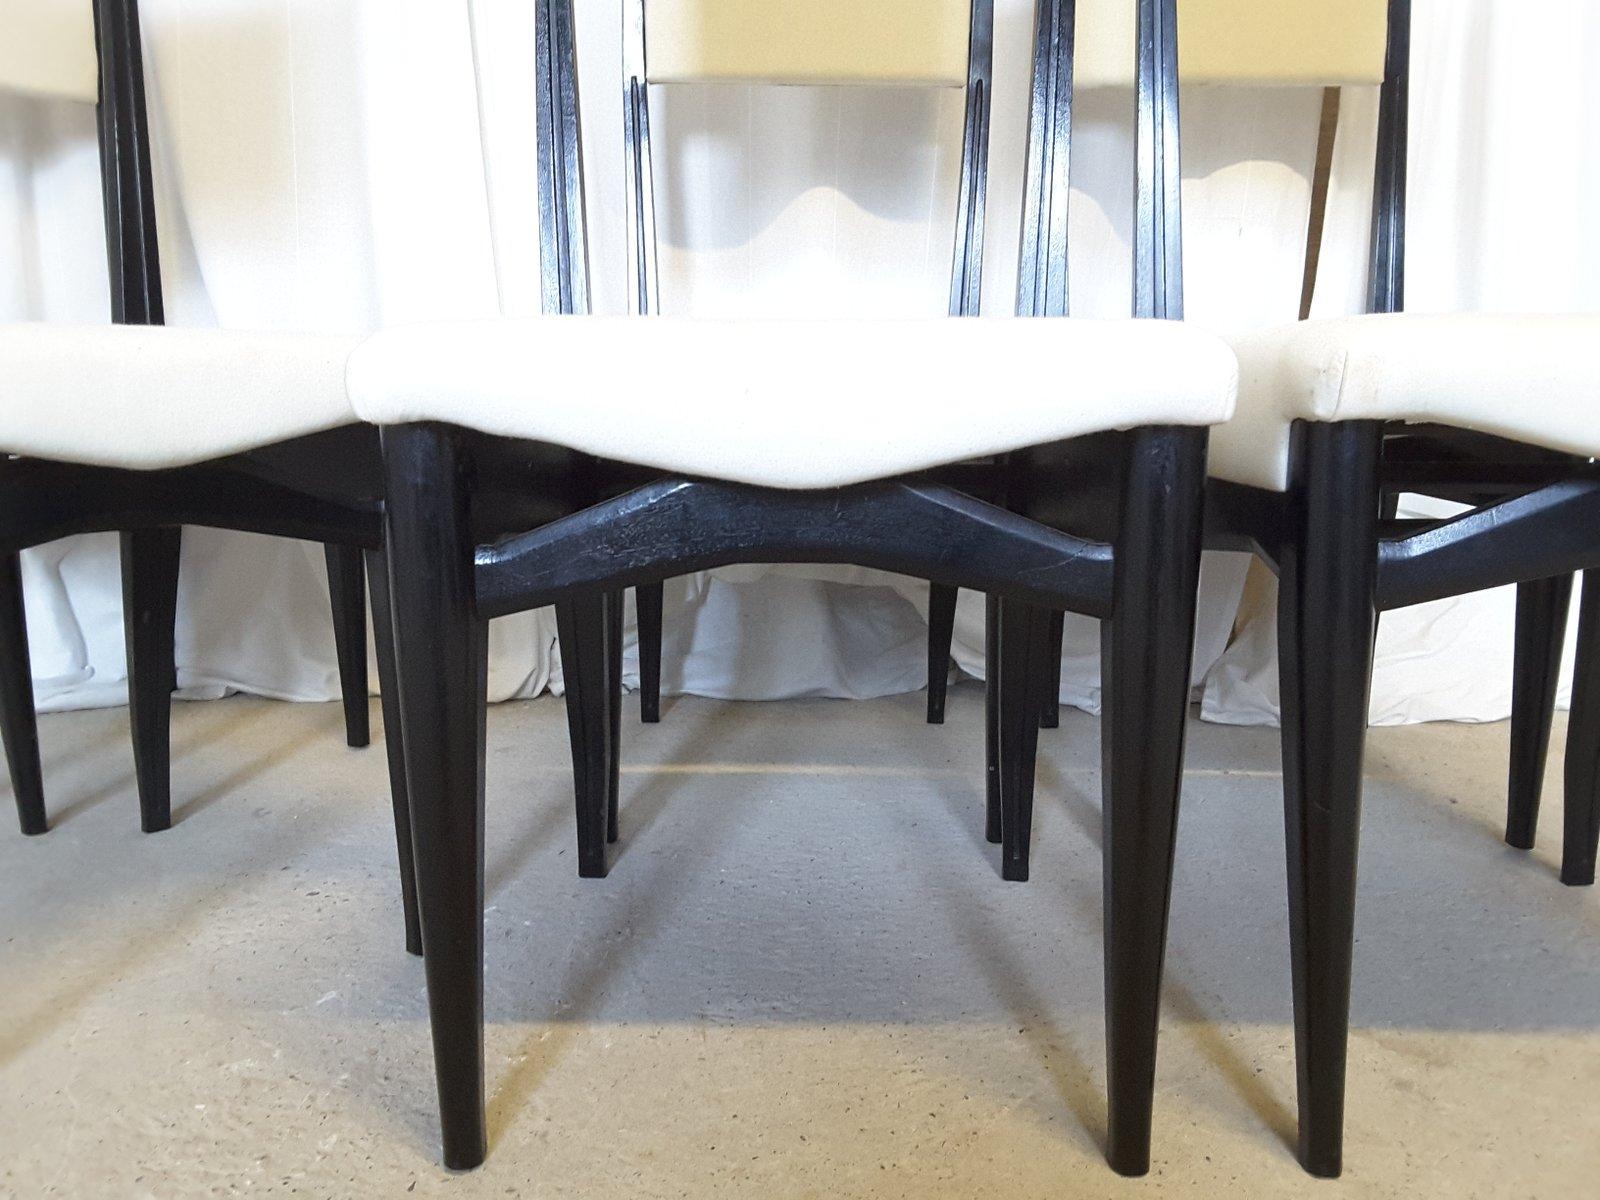 Sillas de comedor italianas con respaldo alto a os 50 for Precio juego de comedor con 6 sillas